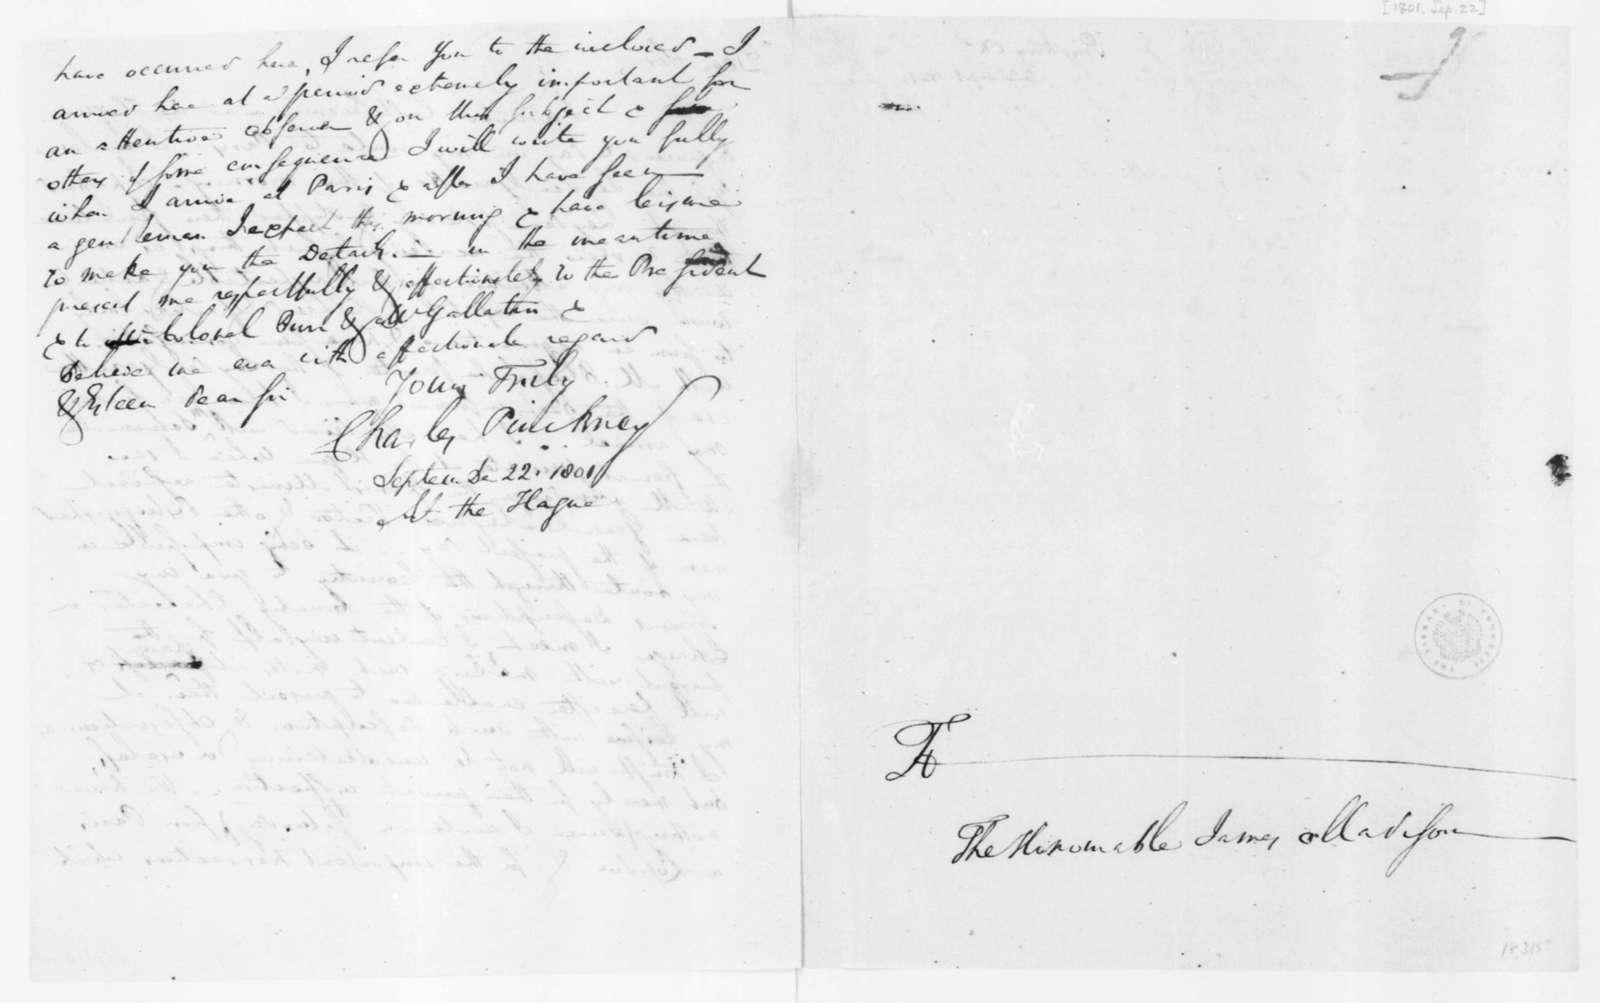 Charles Pinckney to James Madison, September 22, 1801.